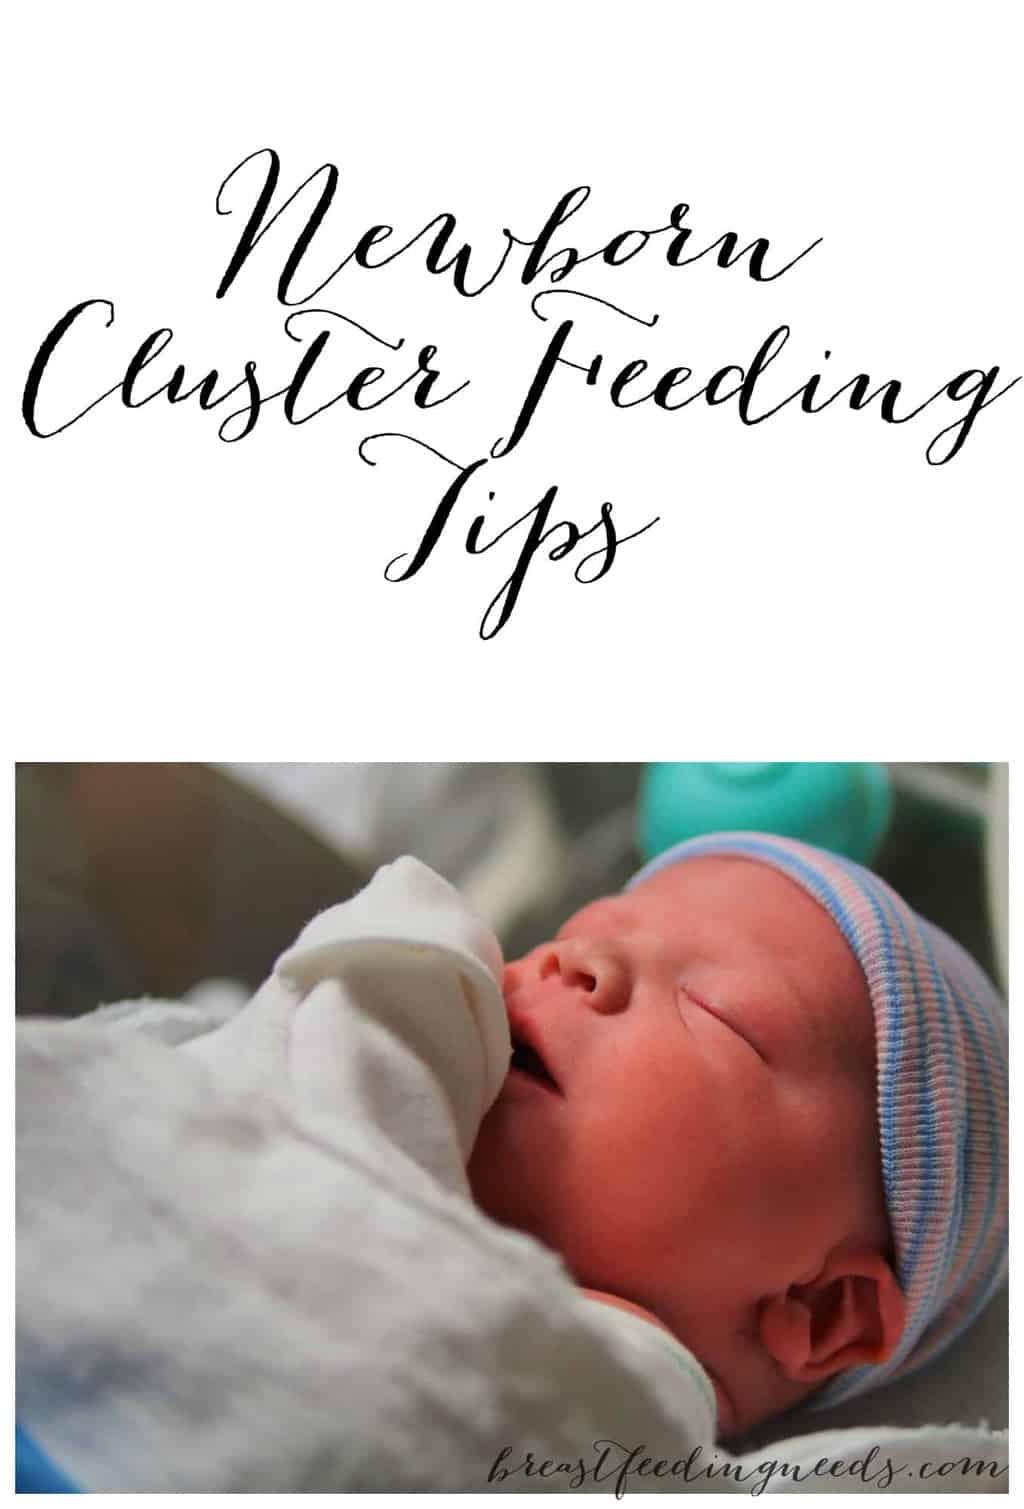 Newborn Cluster Feeding Tips